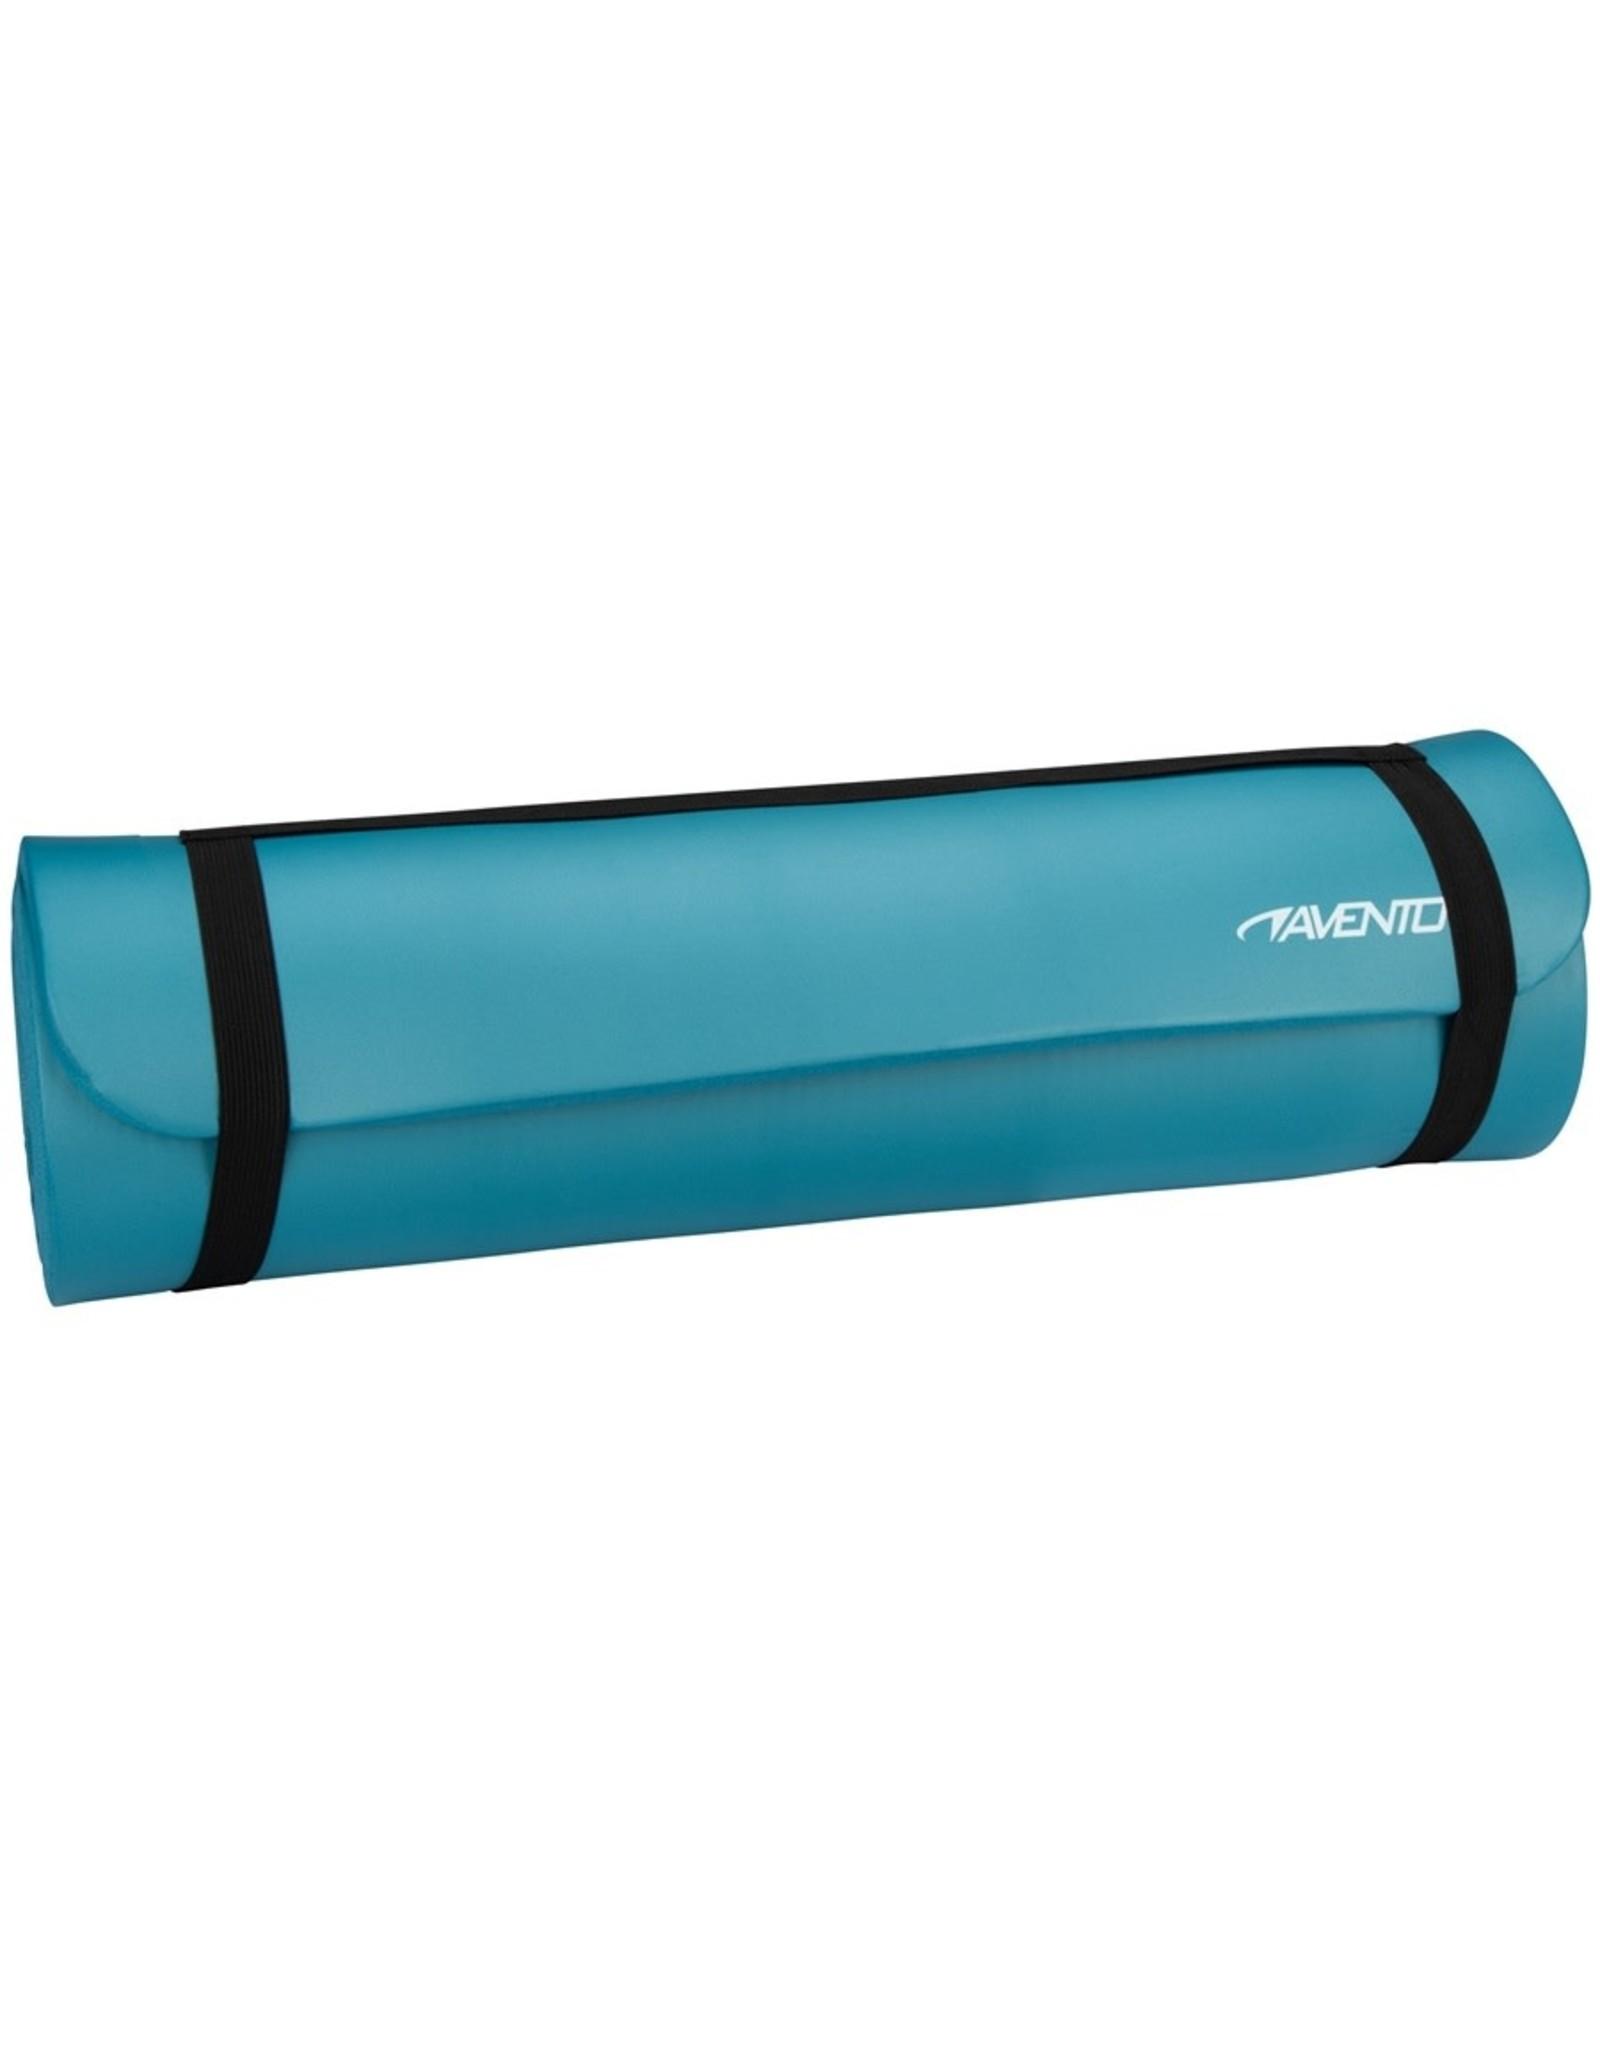 Avento Fitness/Yoga Mat NBR